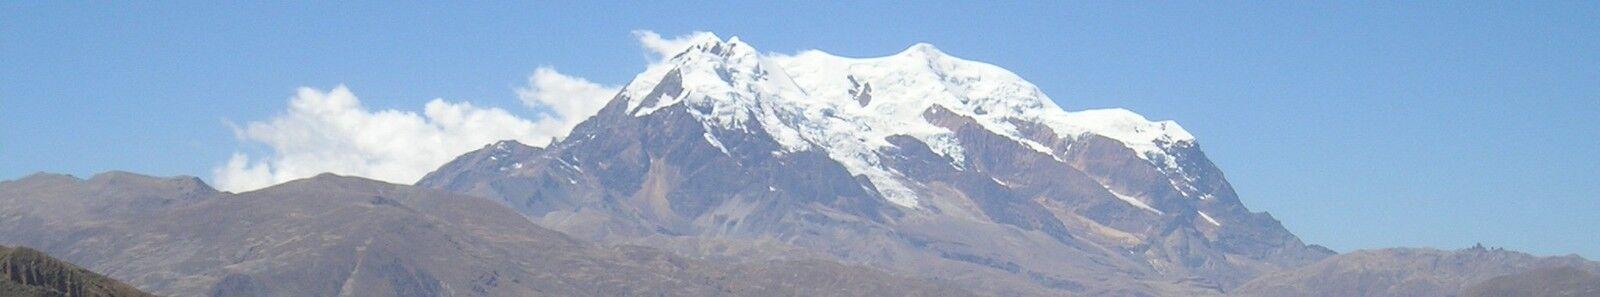 BOLIVIAN FOSSILS